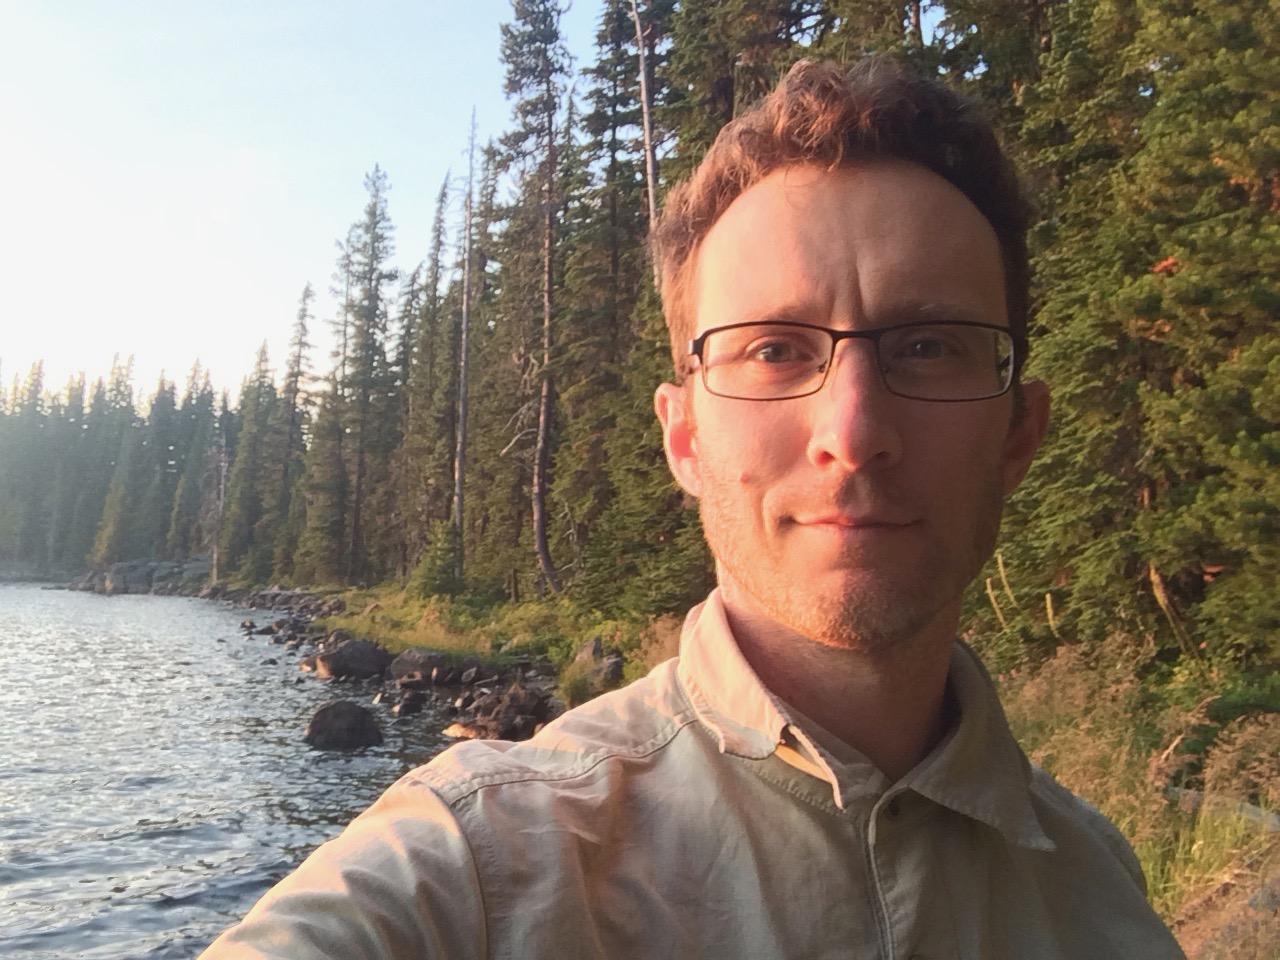 Jayson on the shores of Waldo Lake